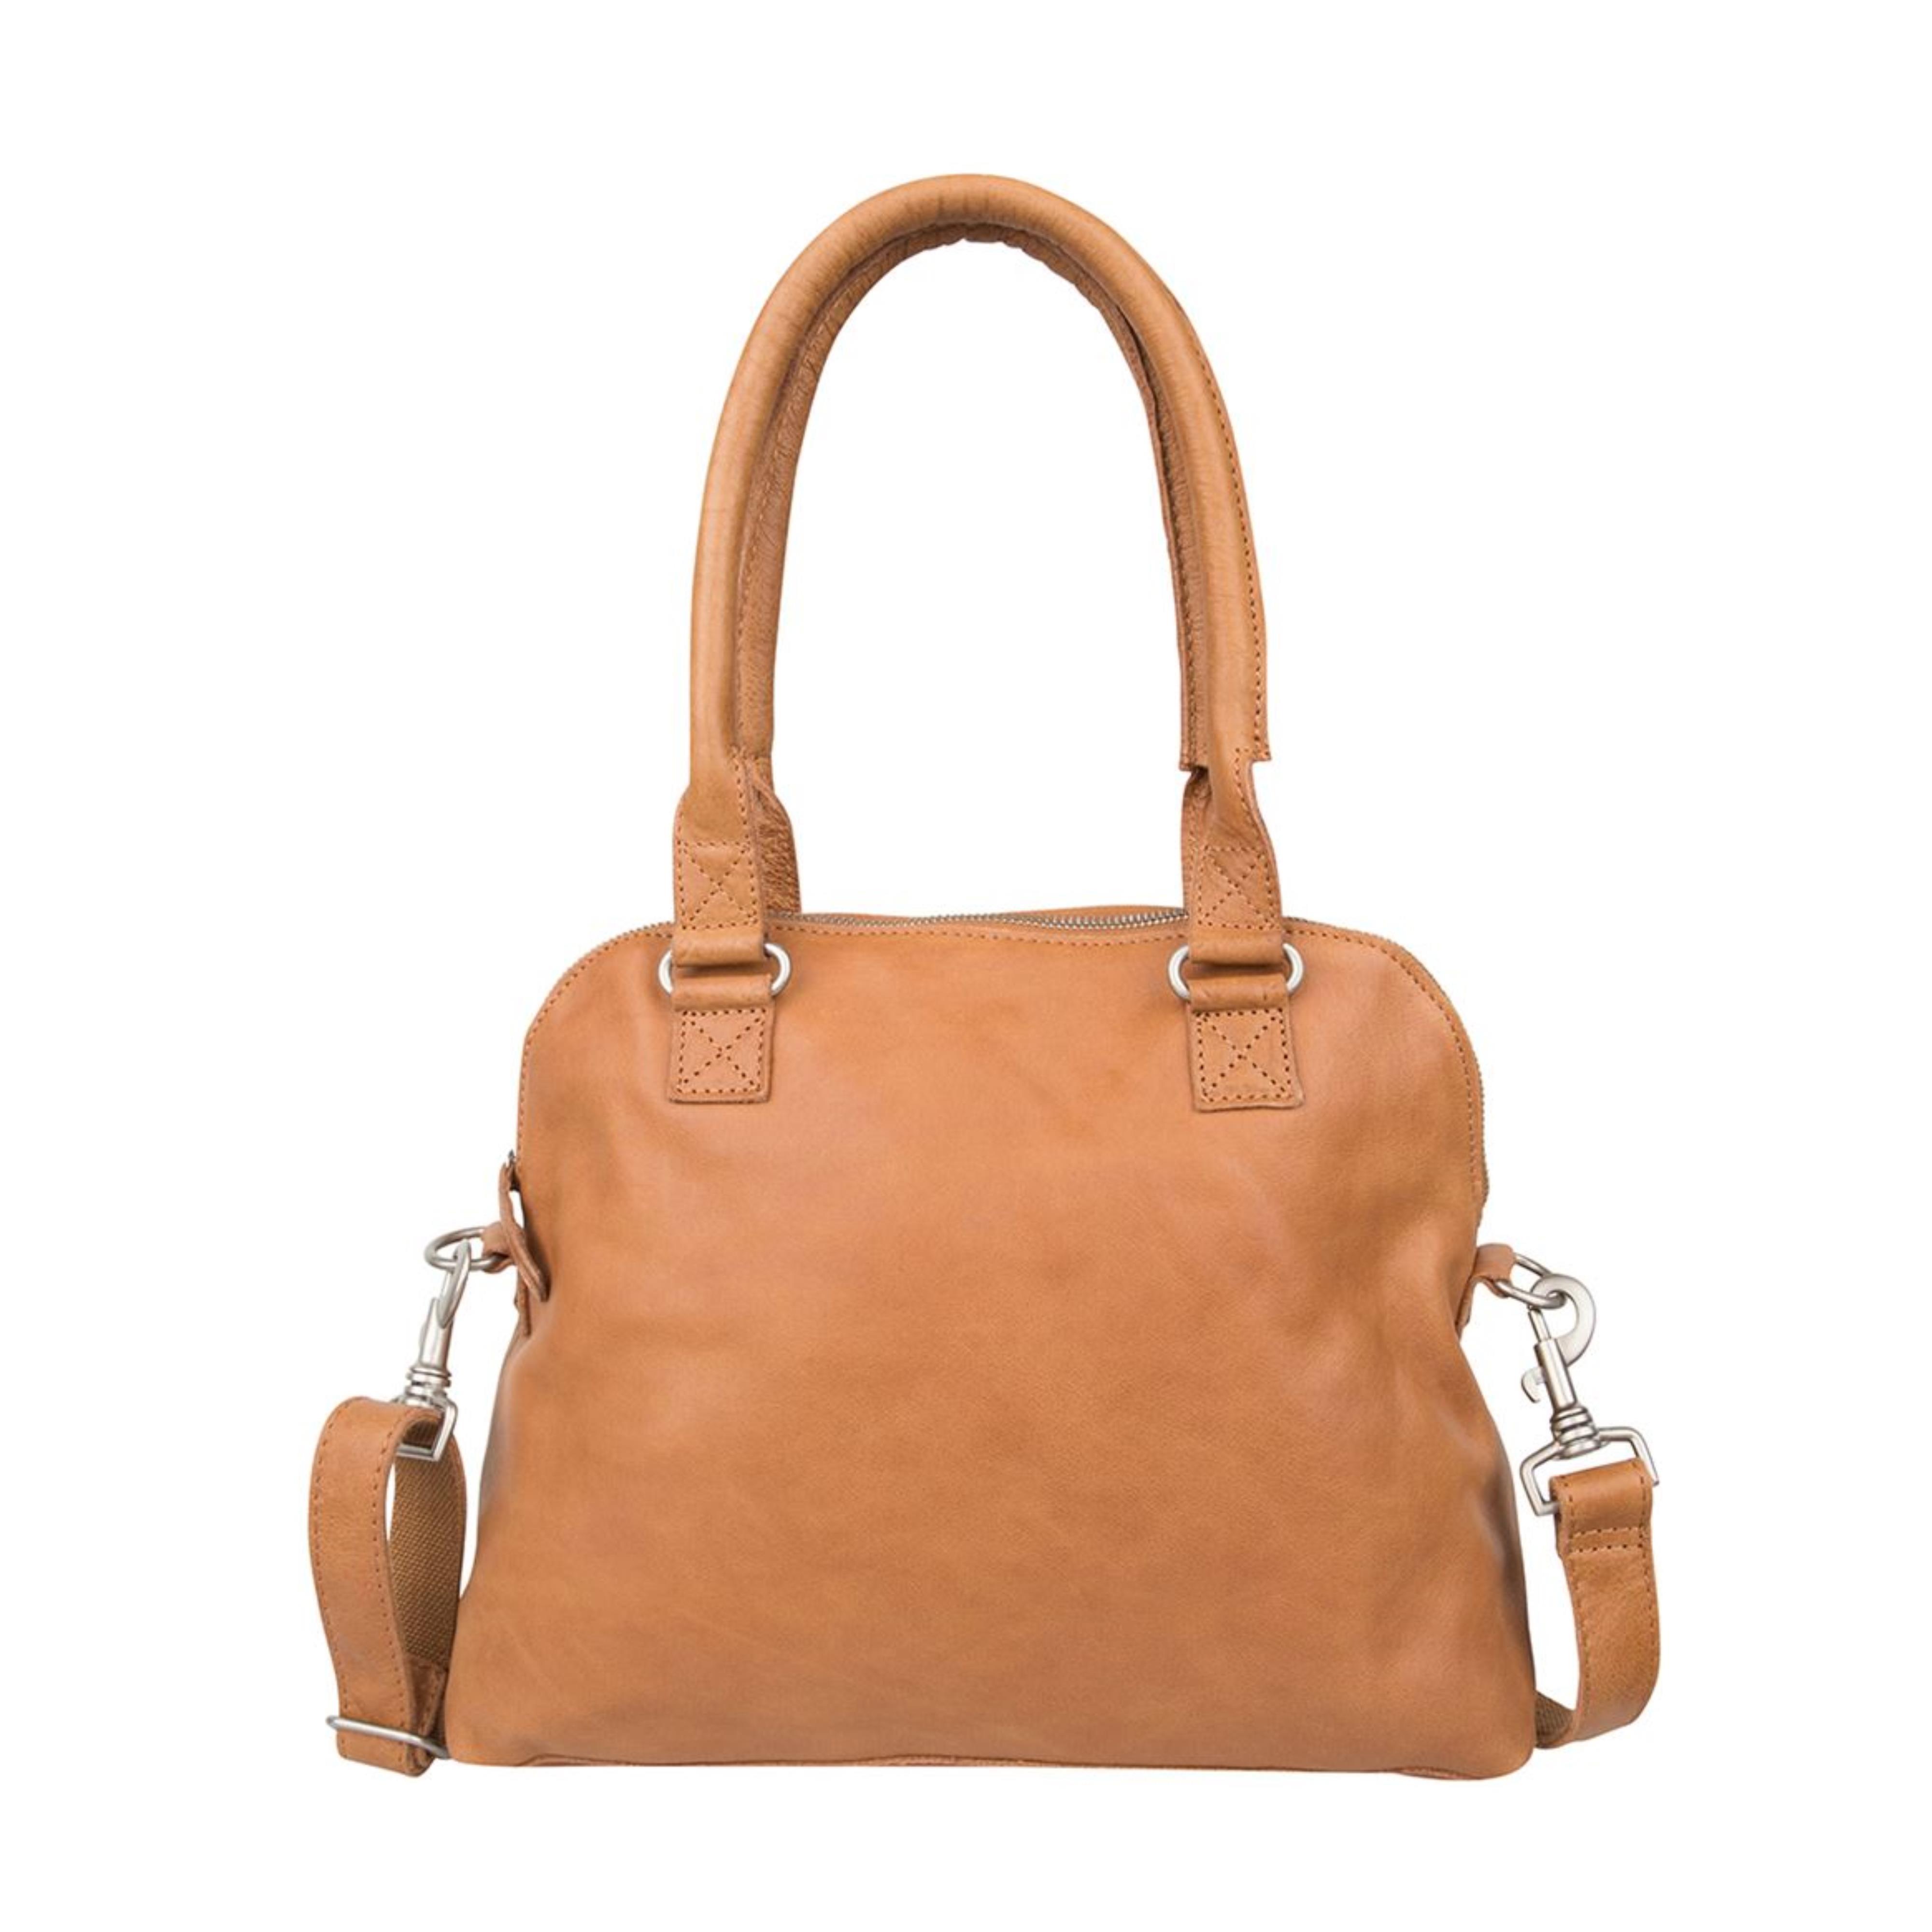 dabf72f5dae18 COWBOYSBAG Tasche Henkeltasche BAG CARFIN Tobacco 1645 Marke Cowboysbag